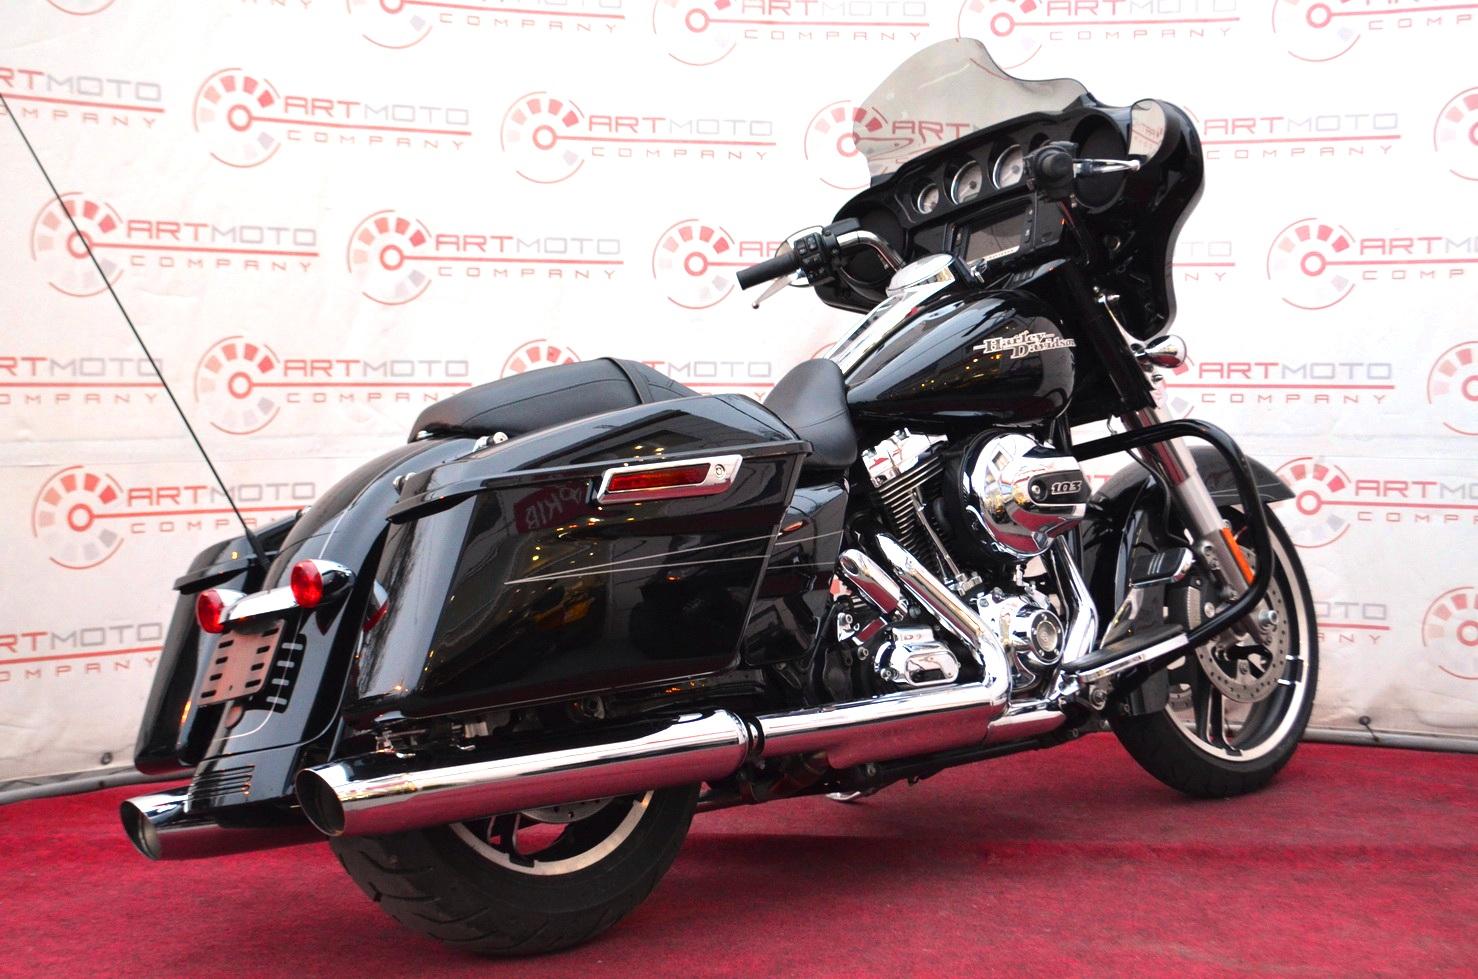 МОТОЦИКЛ HARLEY DAVIDSON FLHXS STREET GLIDE 2015  Артмото - купить квадроцикл в украине и харькове, мотоцикл, снегоход, скутер, мопед, электромобиль